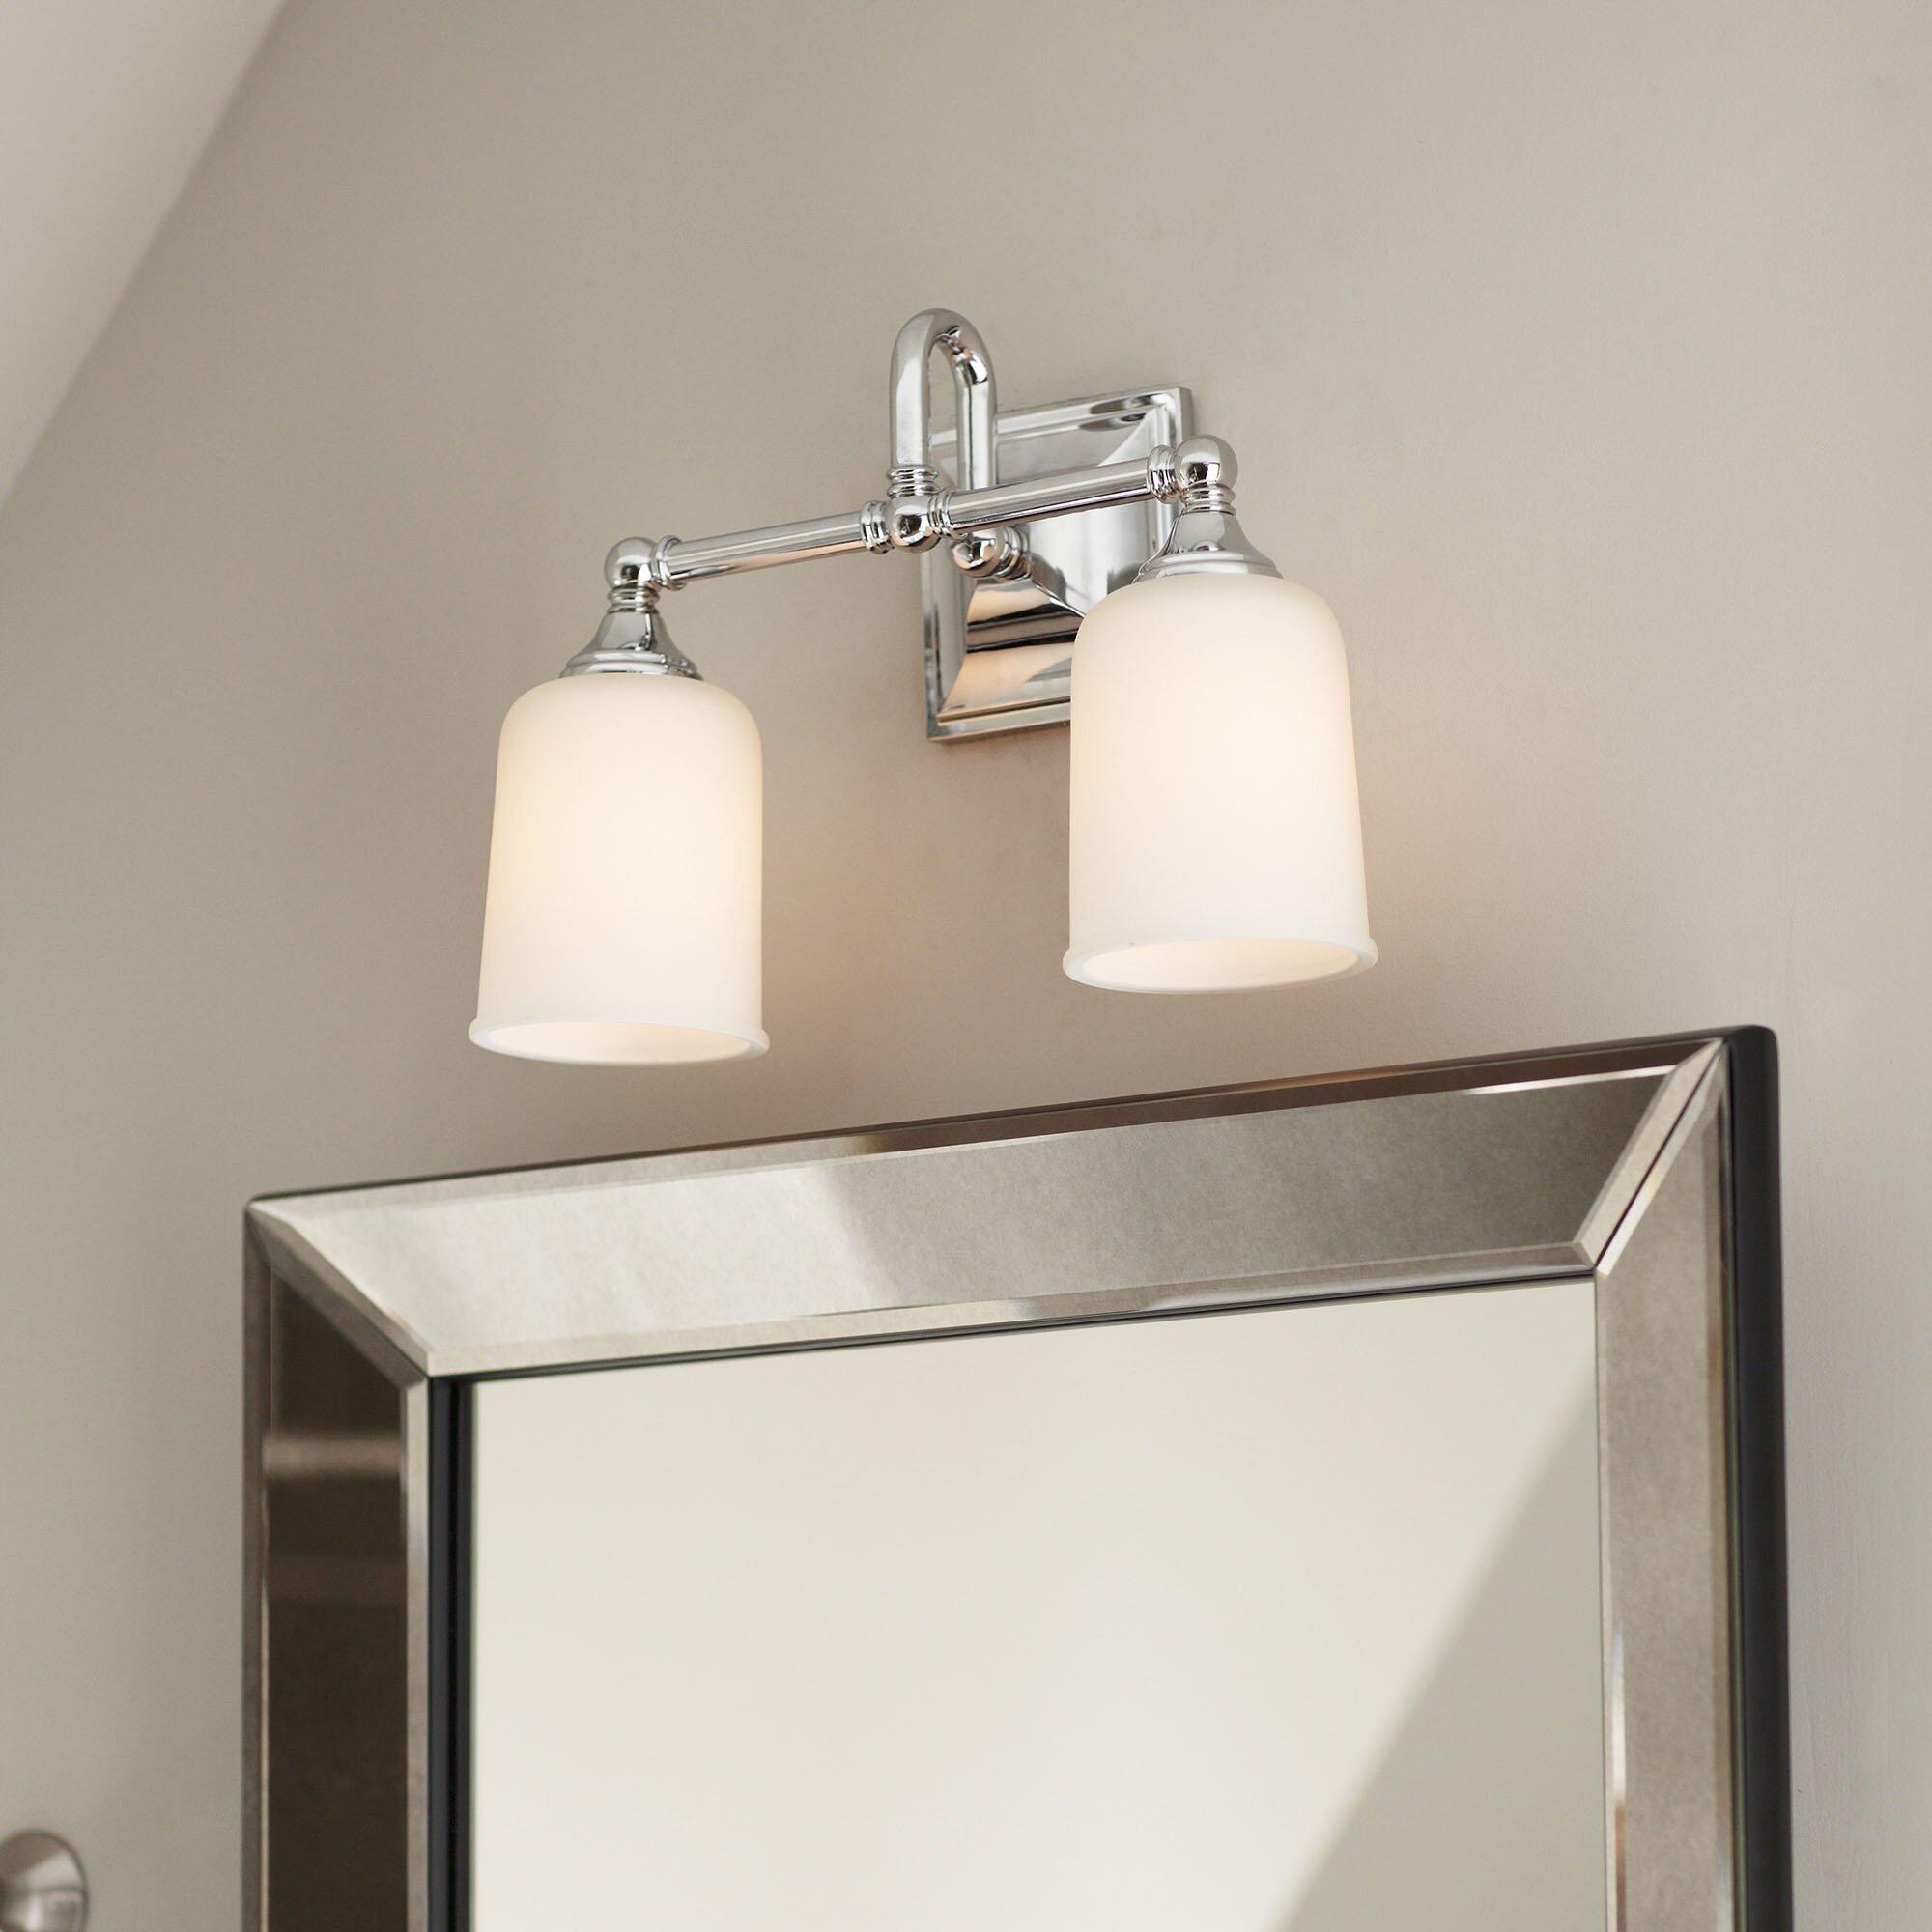 Vanity Lights Beacon : Birch Lane Beacon 2-Bulb Vanity Light & Reviews Wayfair